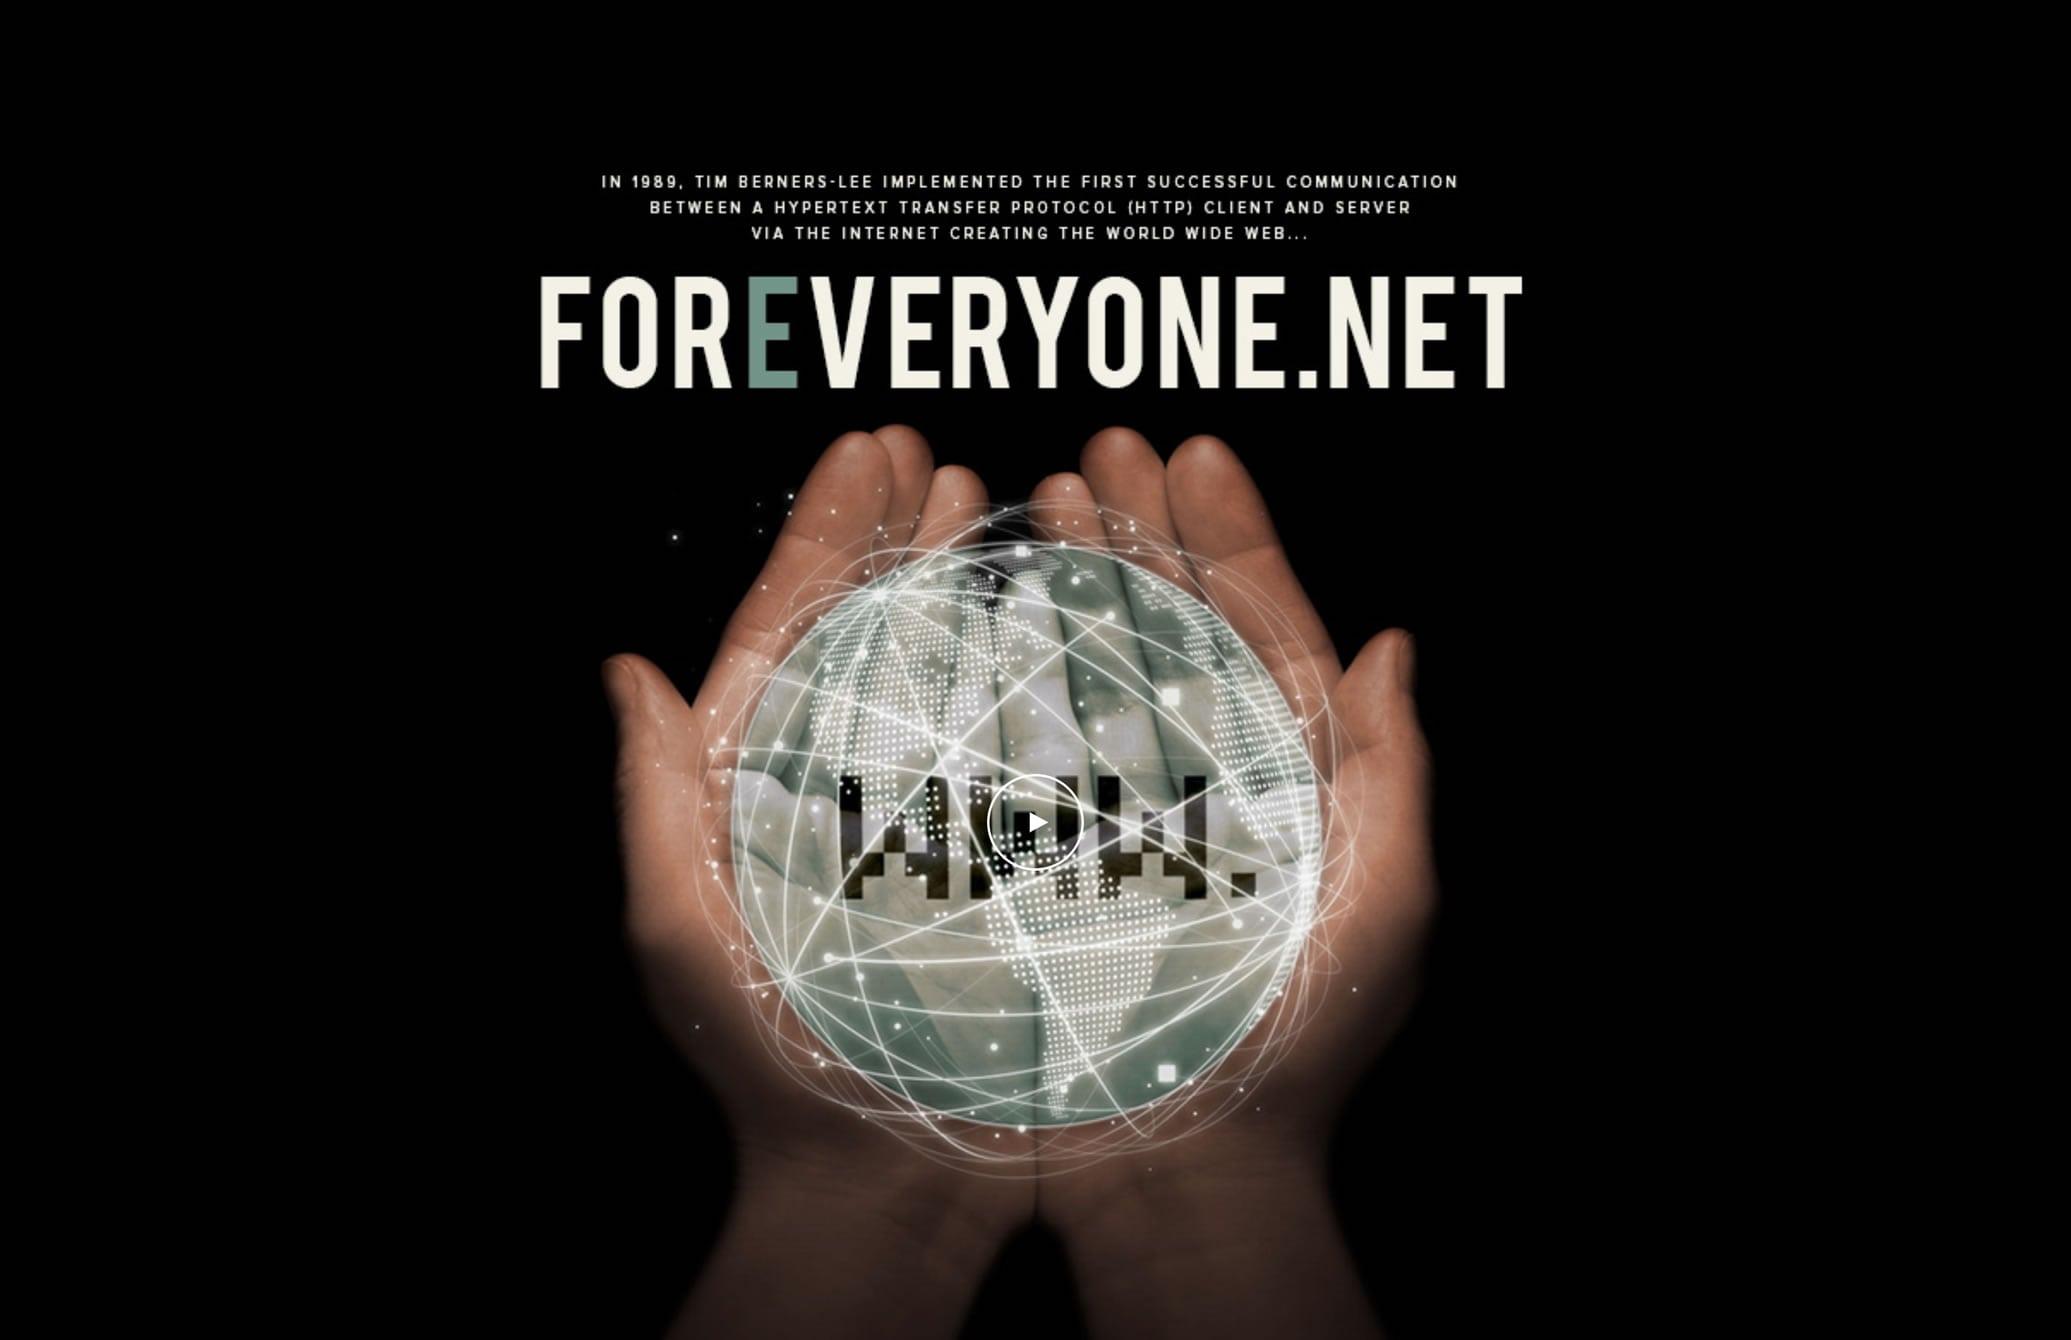 FOREVERYONE.NET